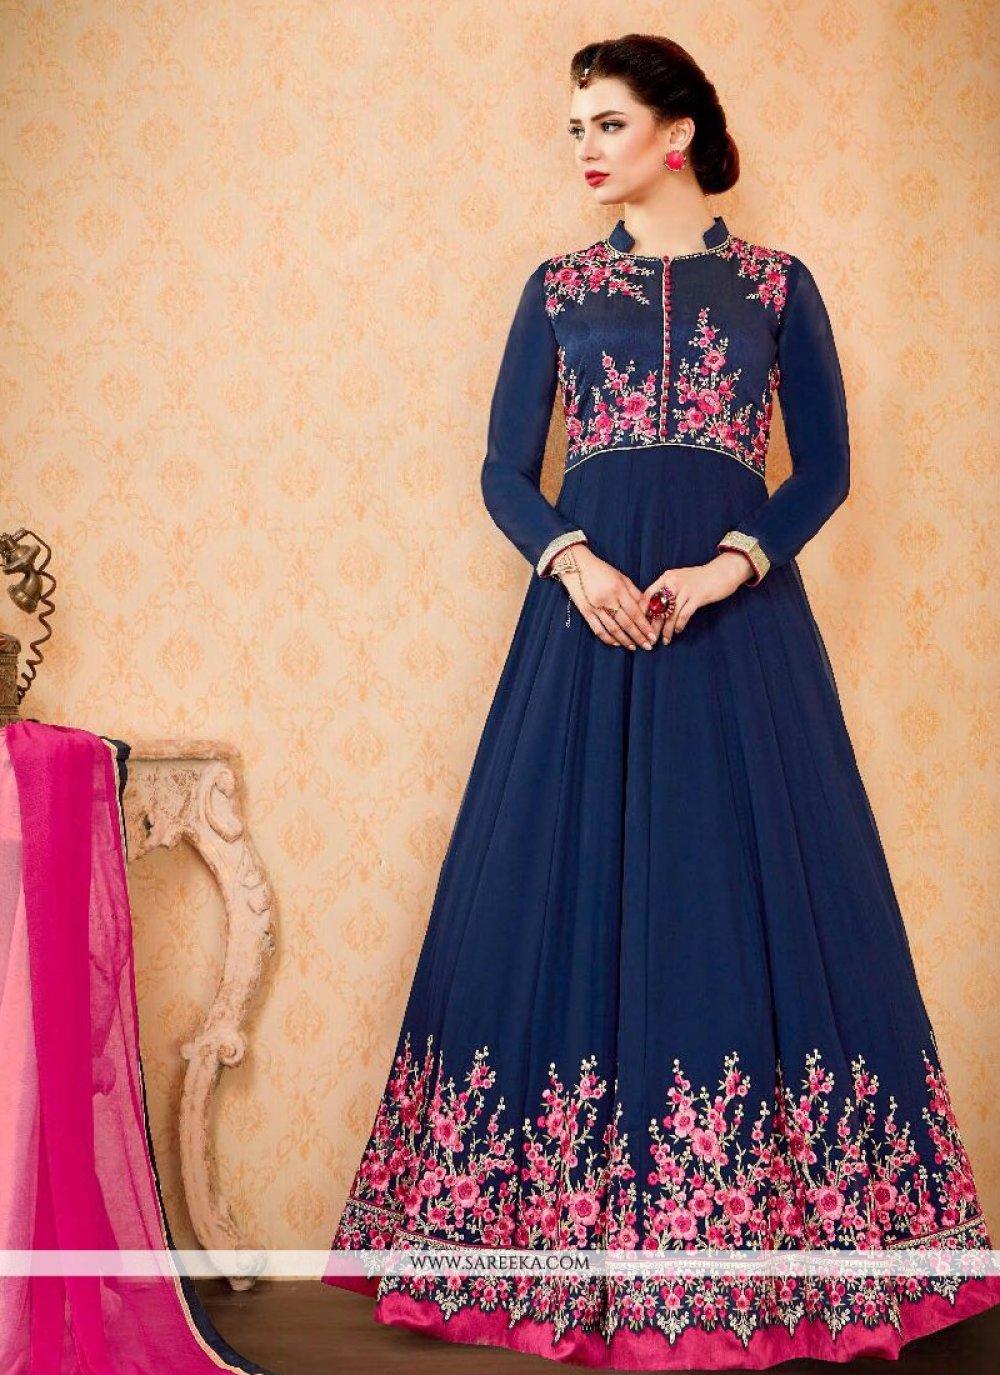 Navy Blue Resham Work Faux Georgette Floor Length Anarkali Suit